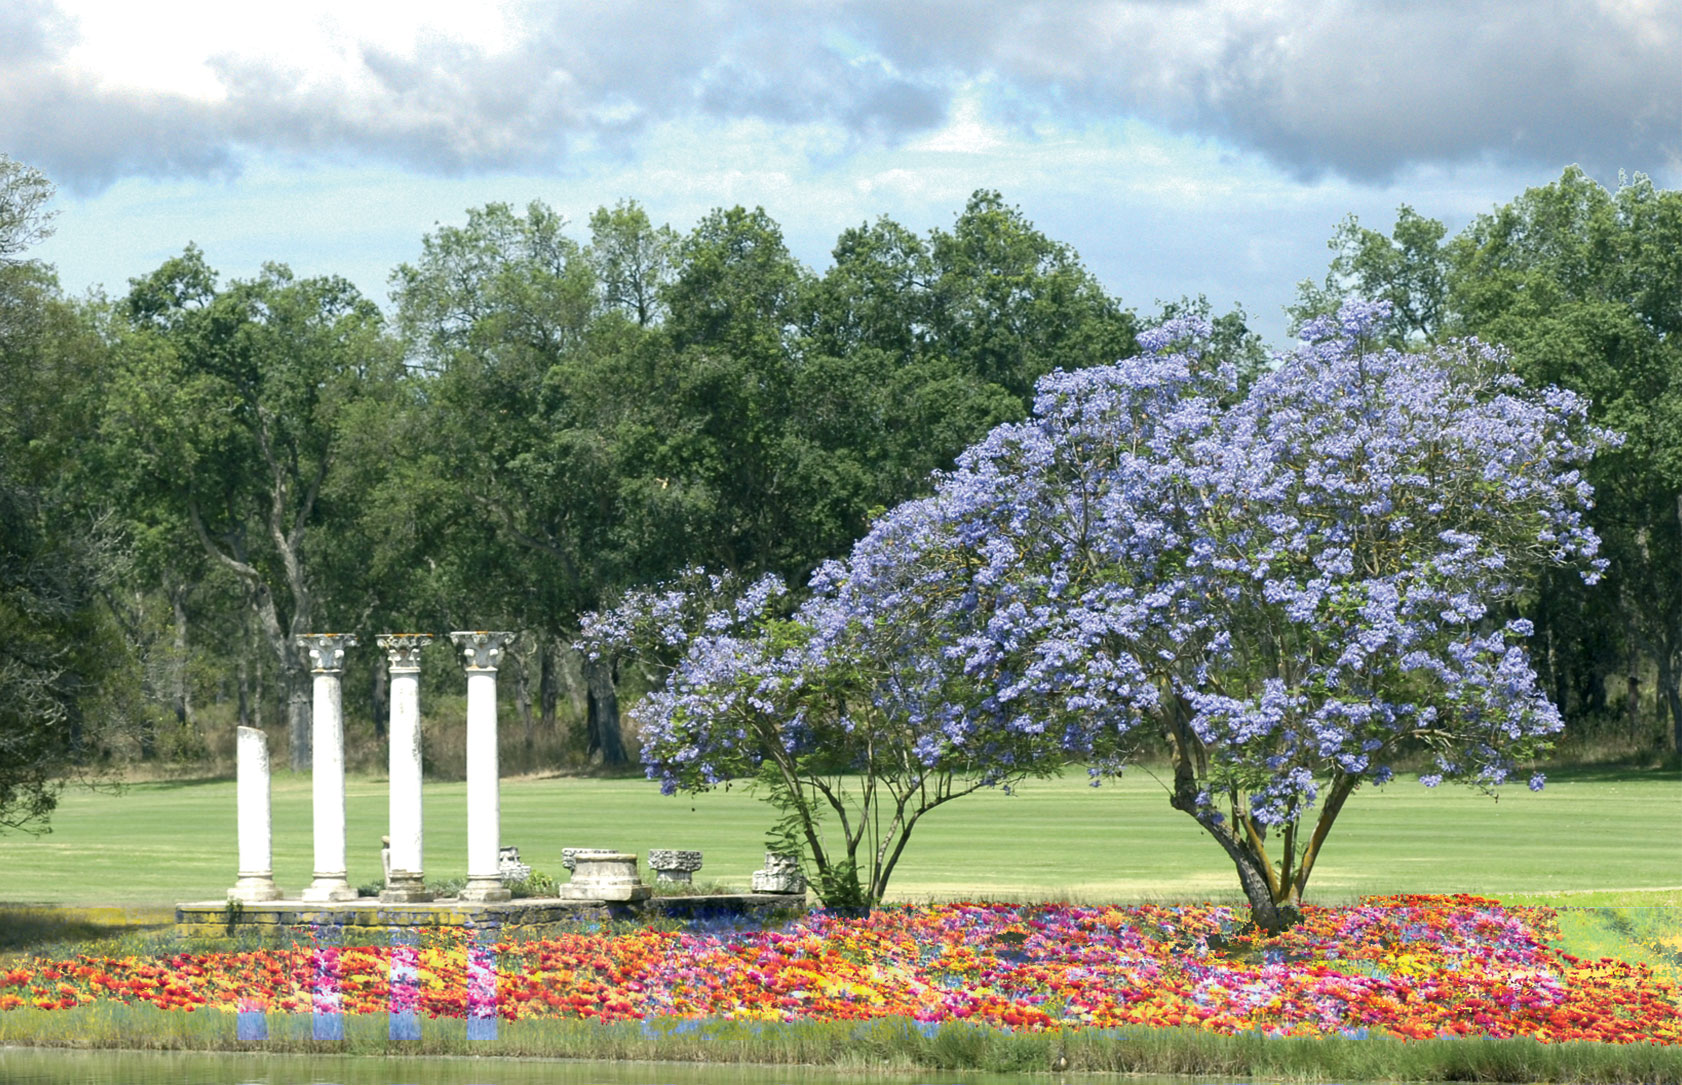 Les fleurs du golf Royal dar es Salam.